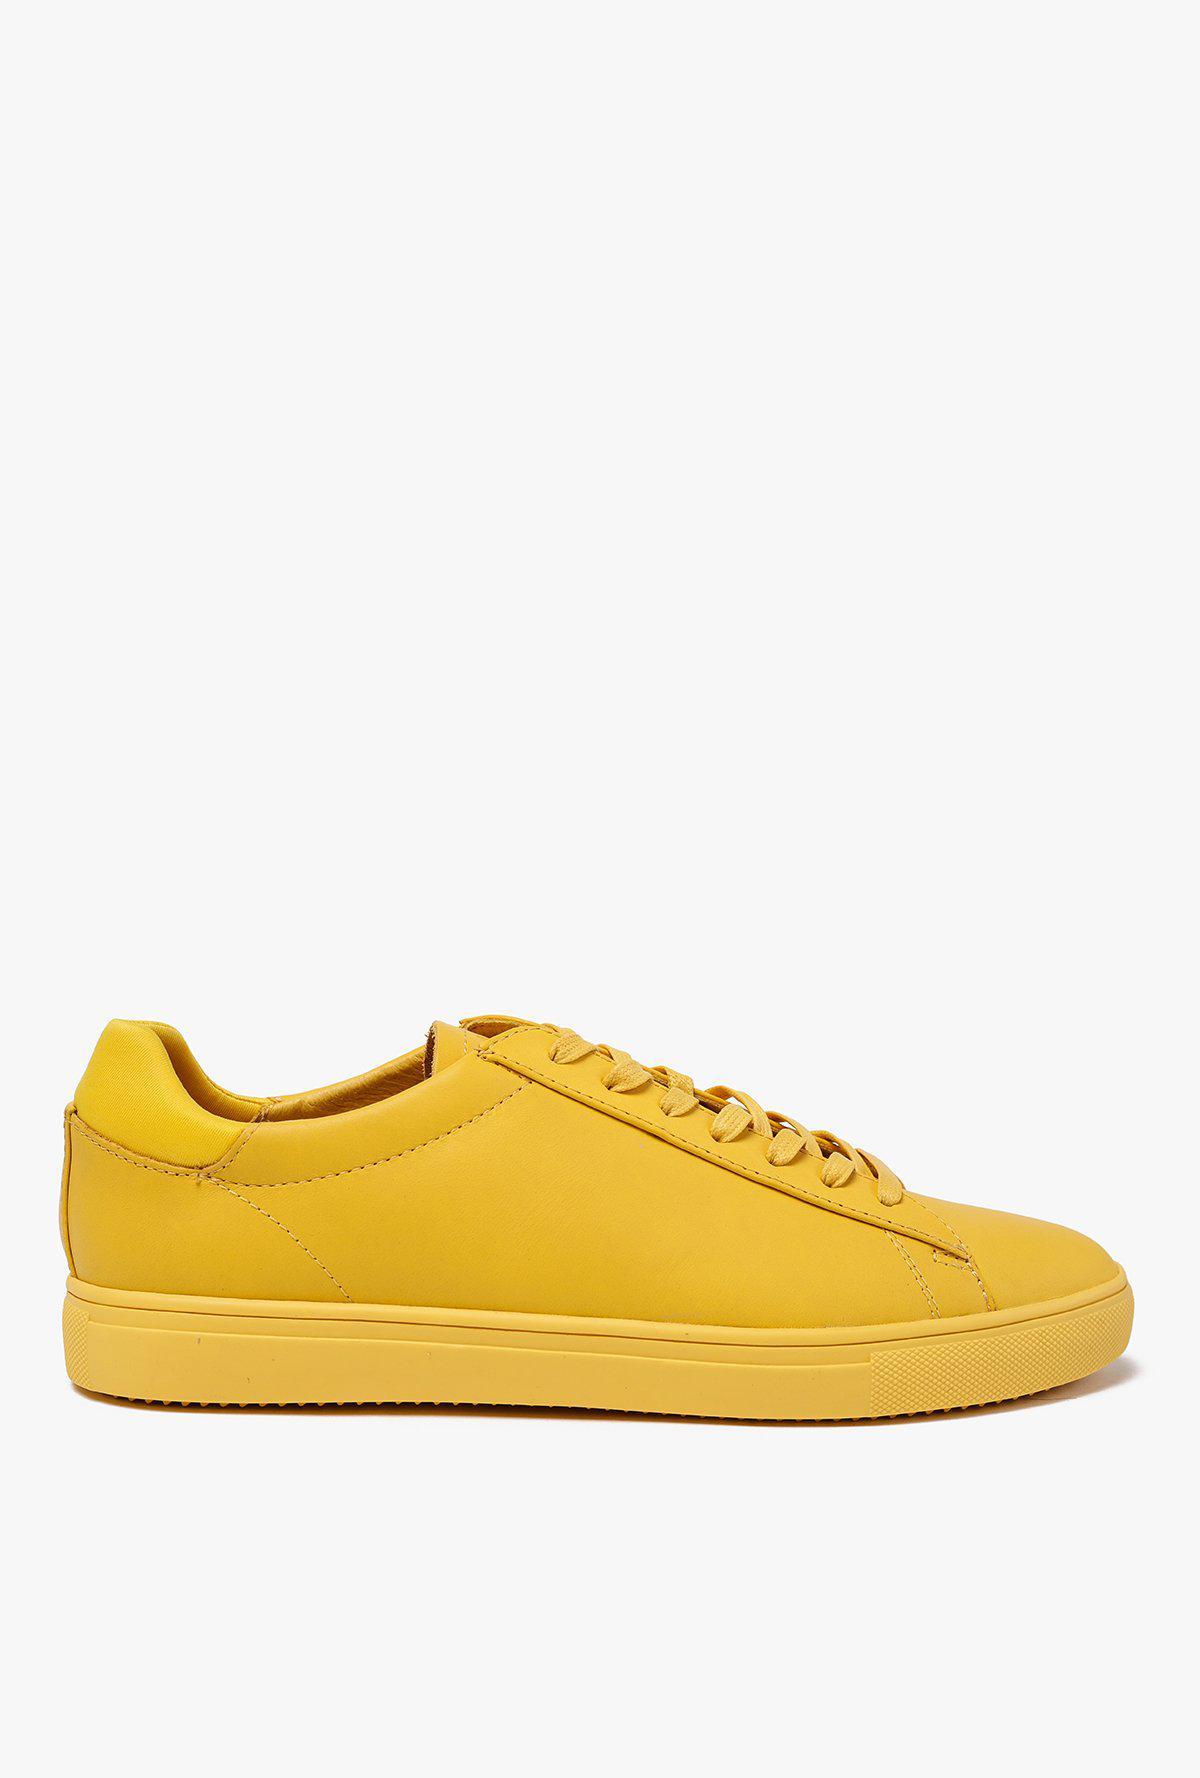 Lyst - CLAE Bradley Sneaker in Yellow for Men 3c6cab6e7ff